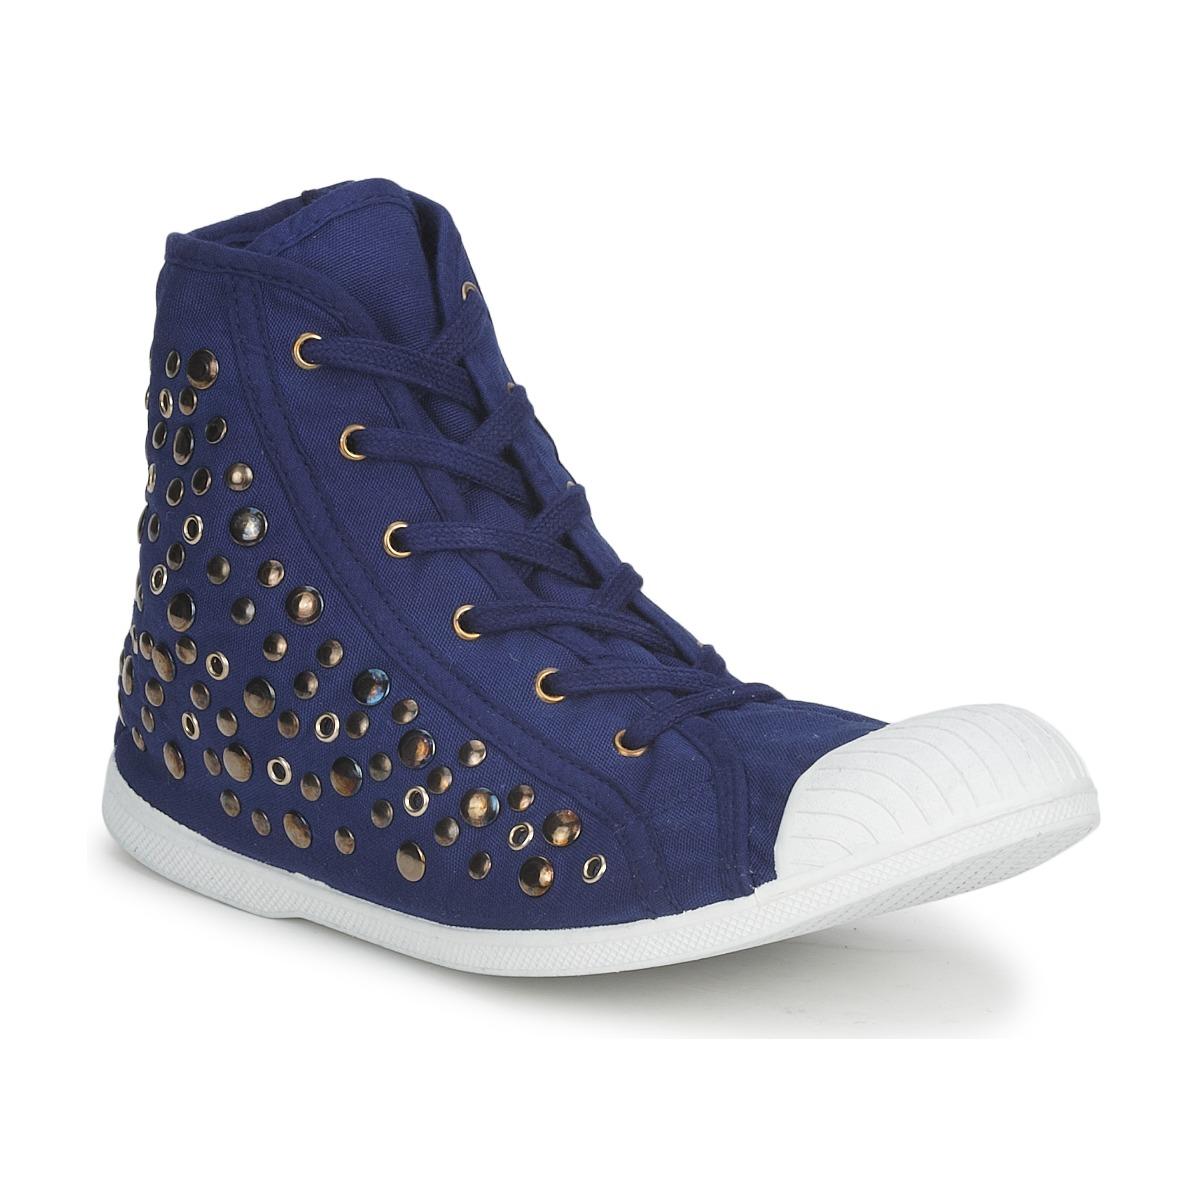 Wati B BEVERLY Marine - Kostenloser Versand bei Spartoode ! - Schuhe Sneaker High Damen 31,10 €